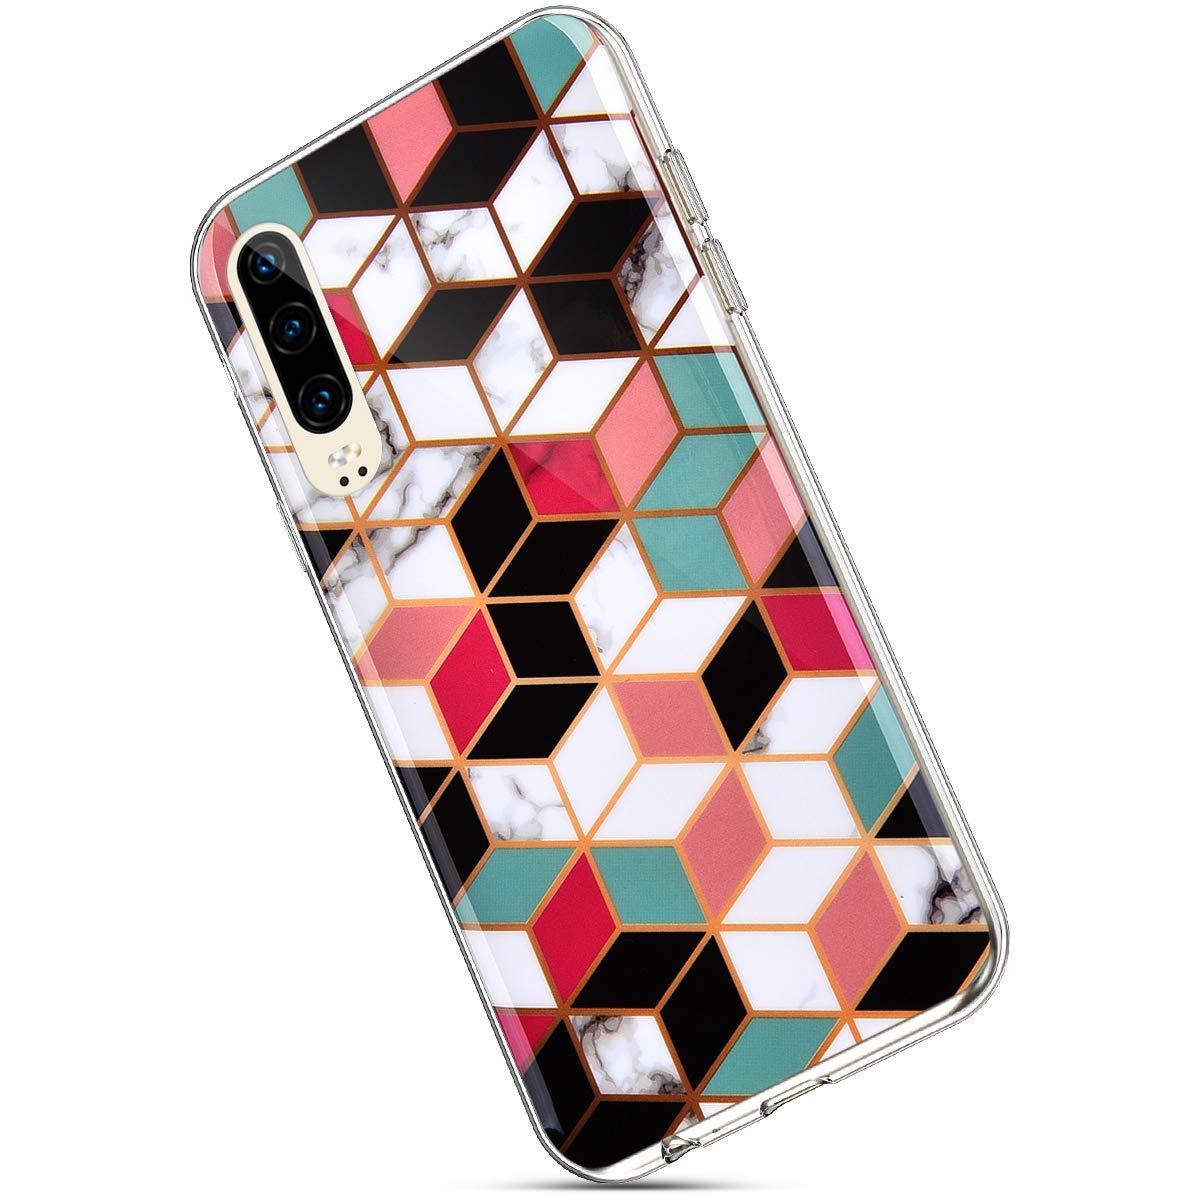 MoreChioce compatible avec Coque Huawei P30,compatible avec Coque Huawei P30 Silicone Marbre,Jolie For/êt Tropicale Hybrid Crystal Flexible Souple TPU Bumper Anti-rayures Defender